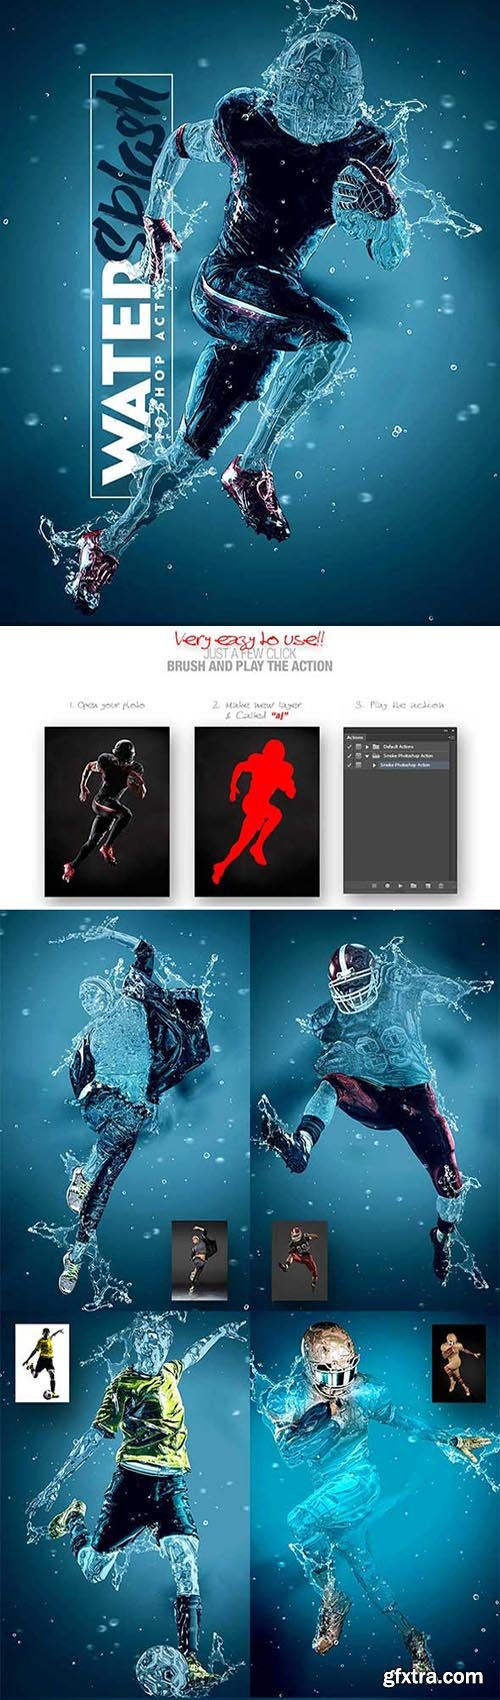 GraphicRiver - Water Splash Photoshop Action 31781792